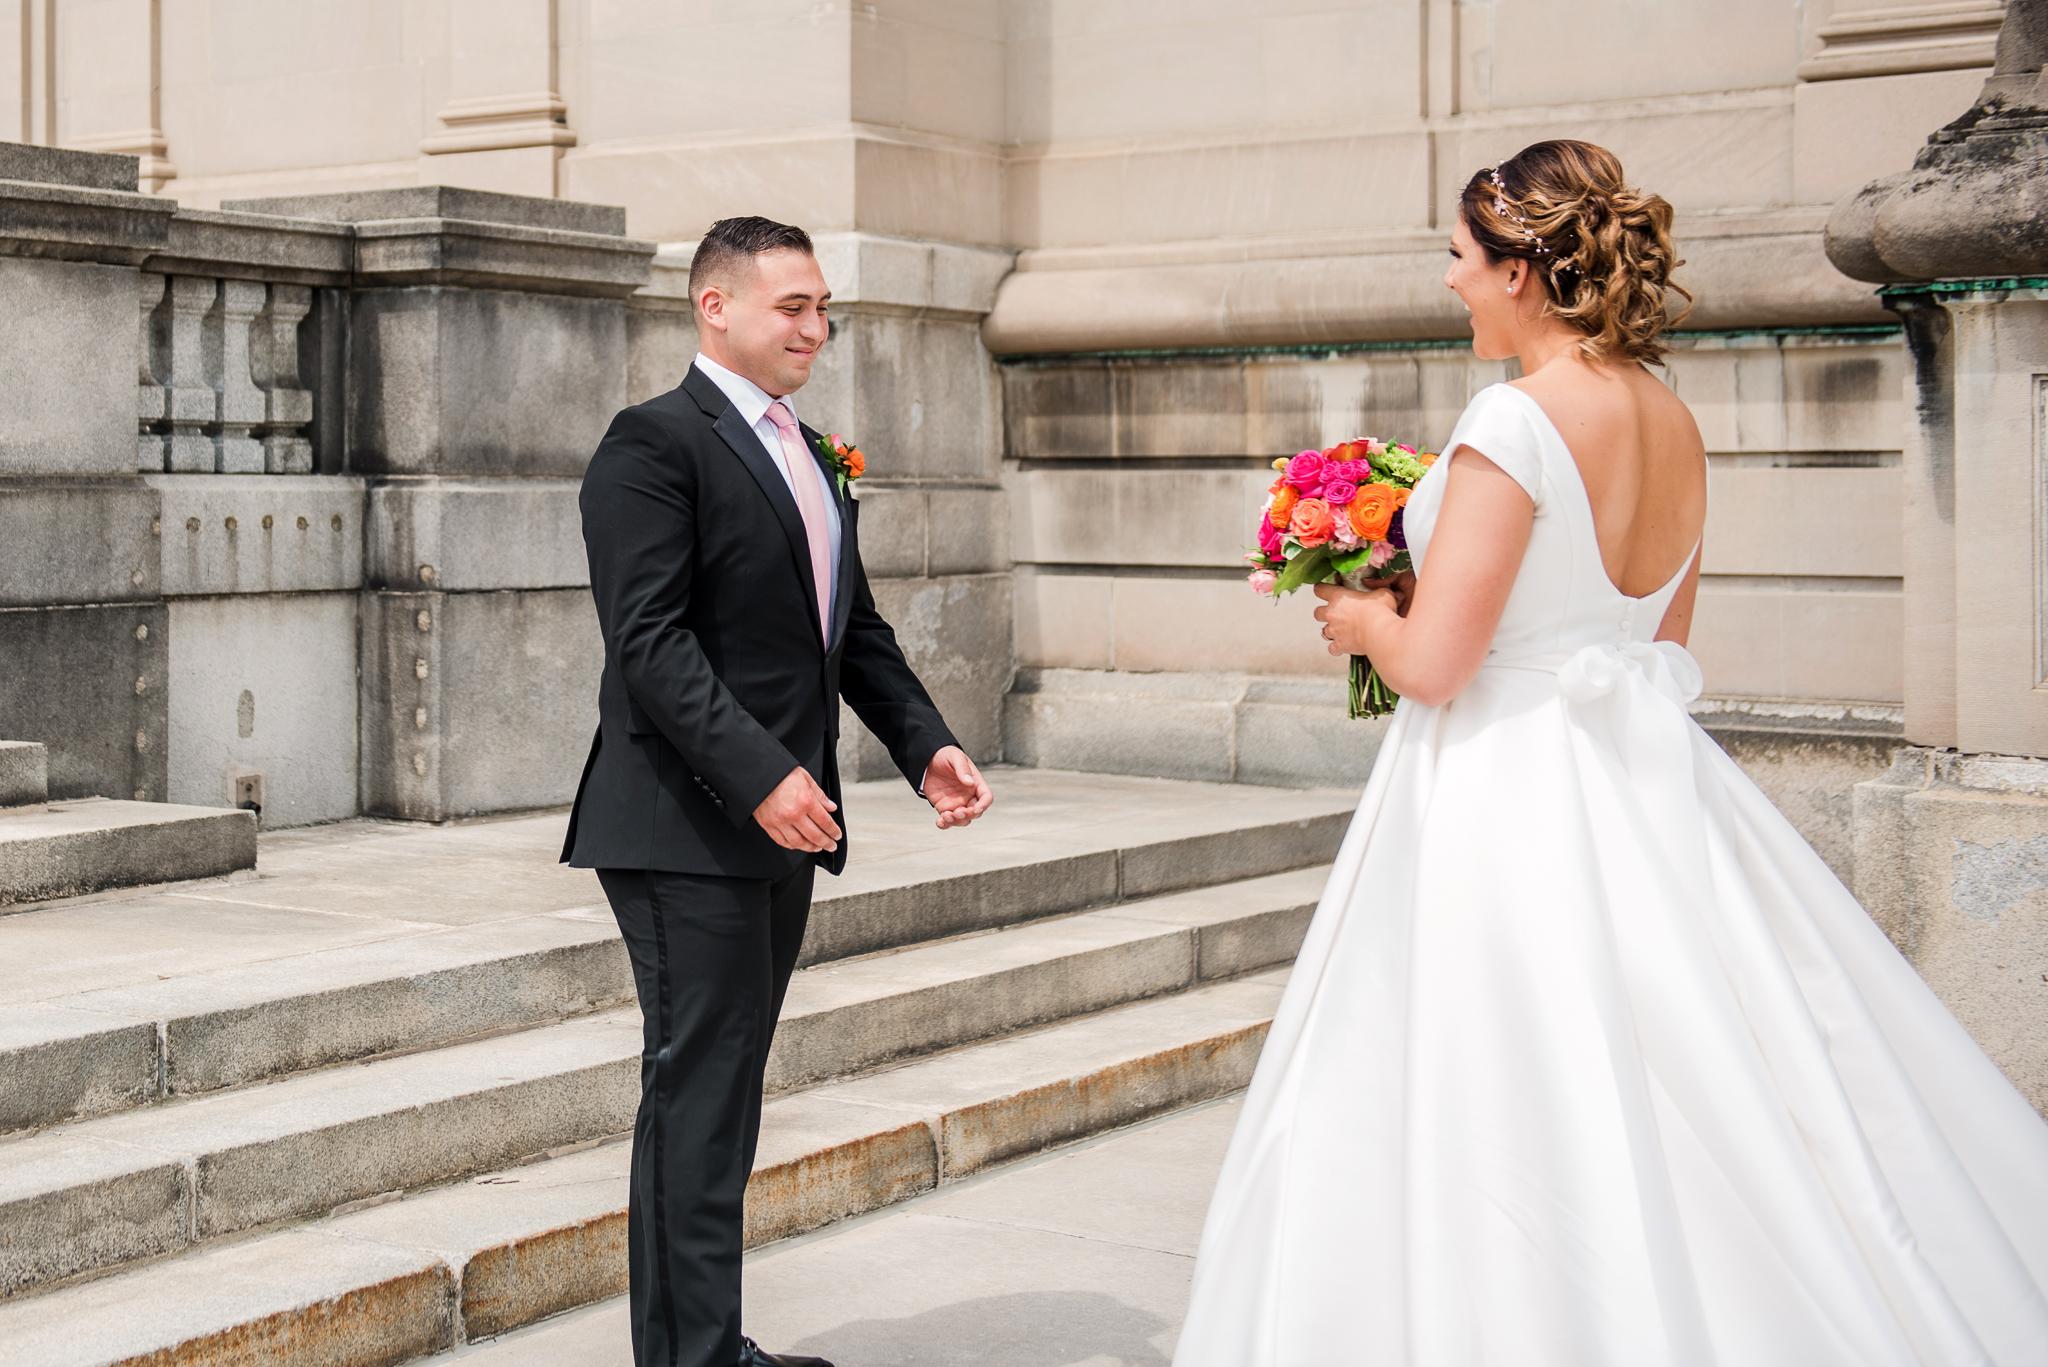 JILLSTUDIO_Blue_Barn_Cidery_Rochester_Wedding_Rochester_NY_Photographer_DSC_8087.jpg